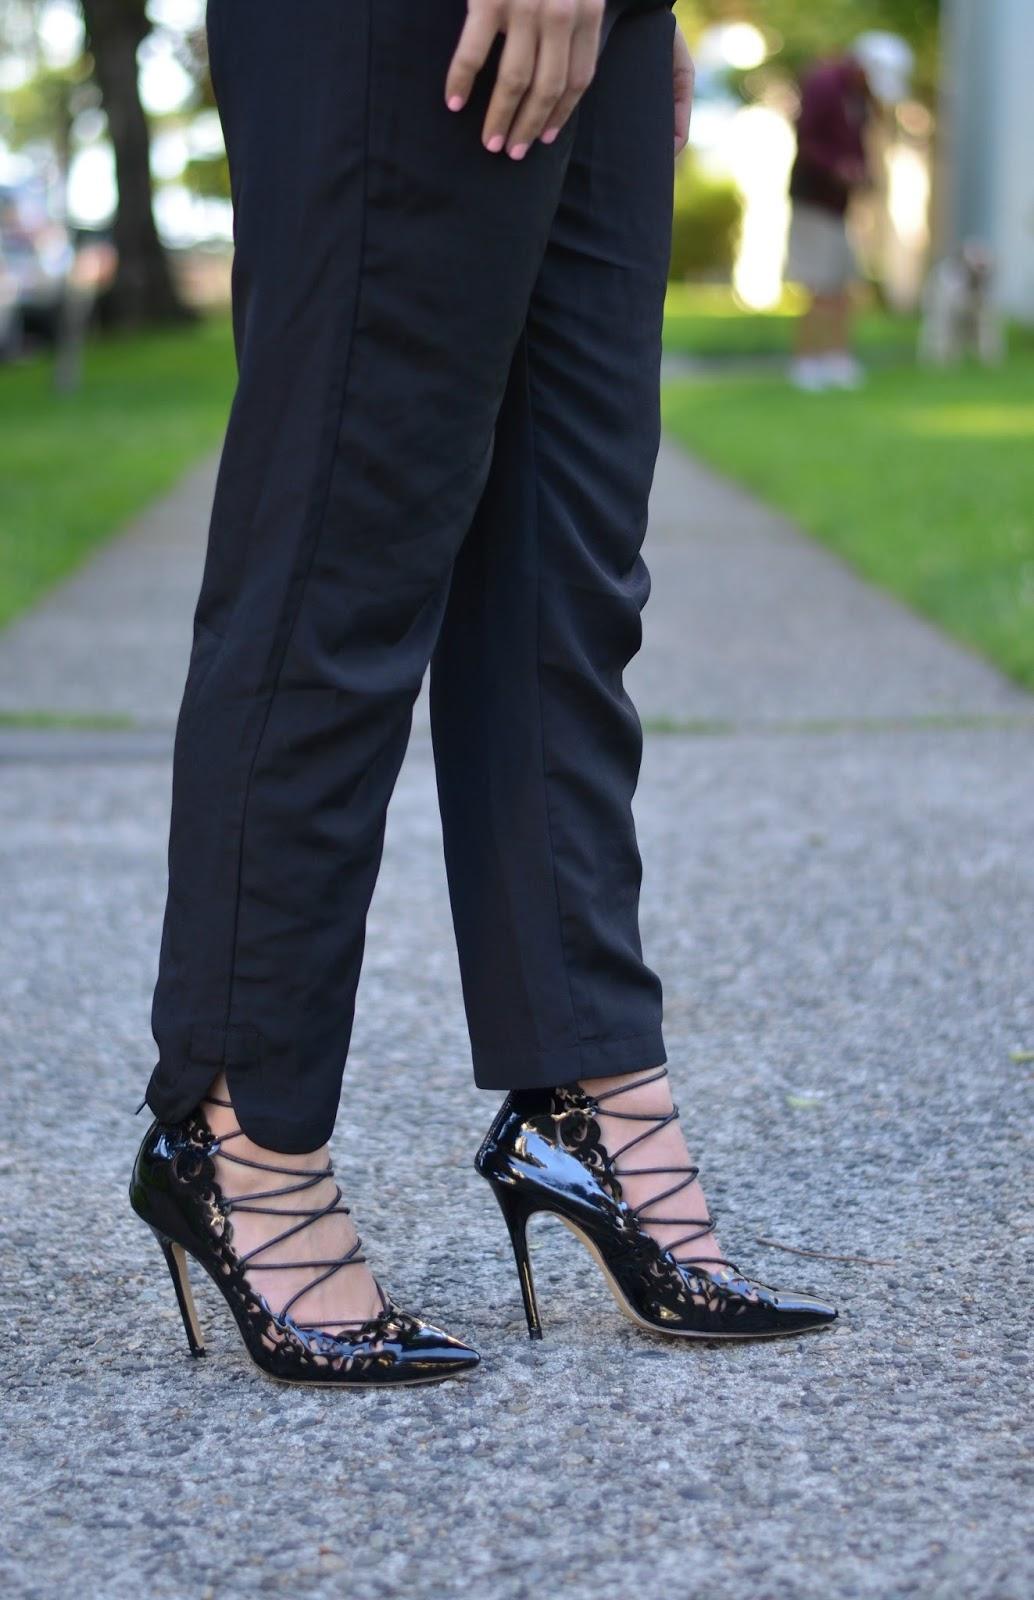 sammy dress black heels